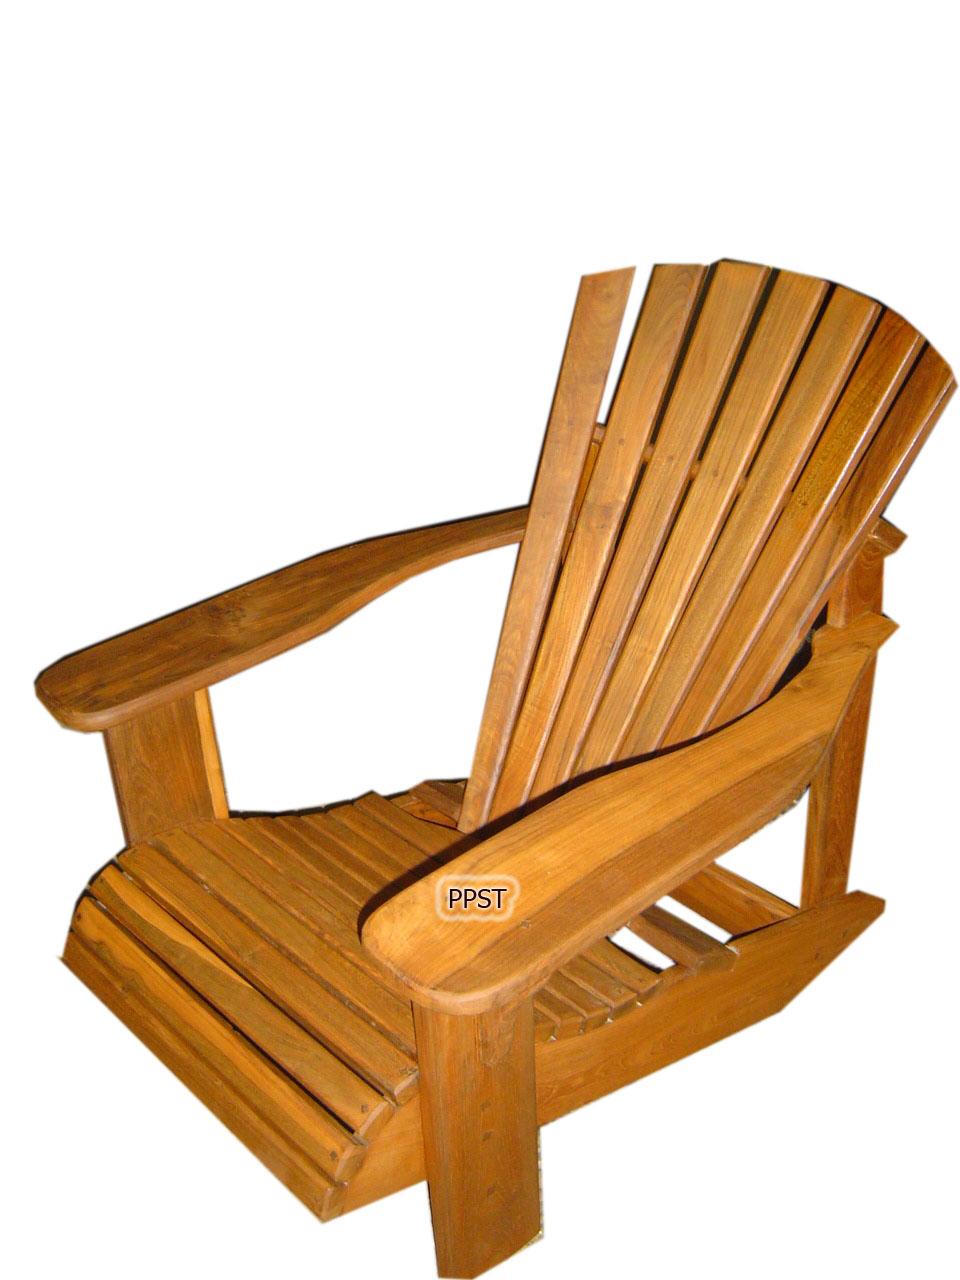 Teak chair-sn006